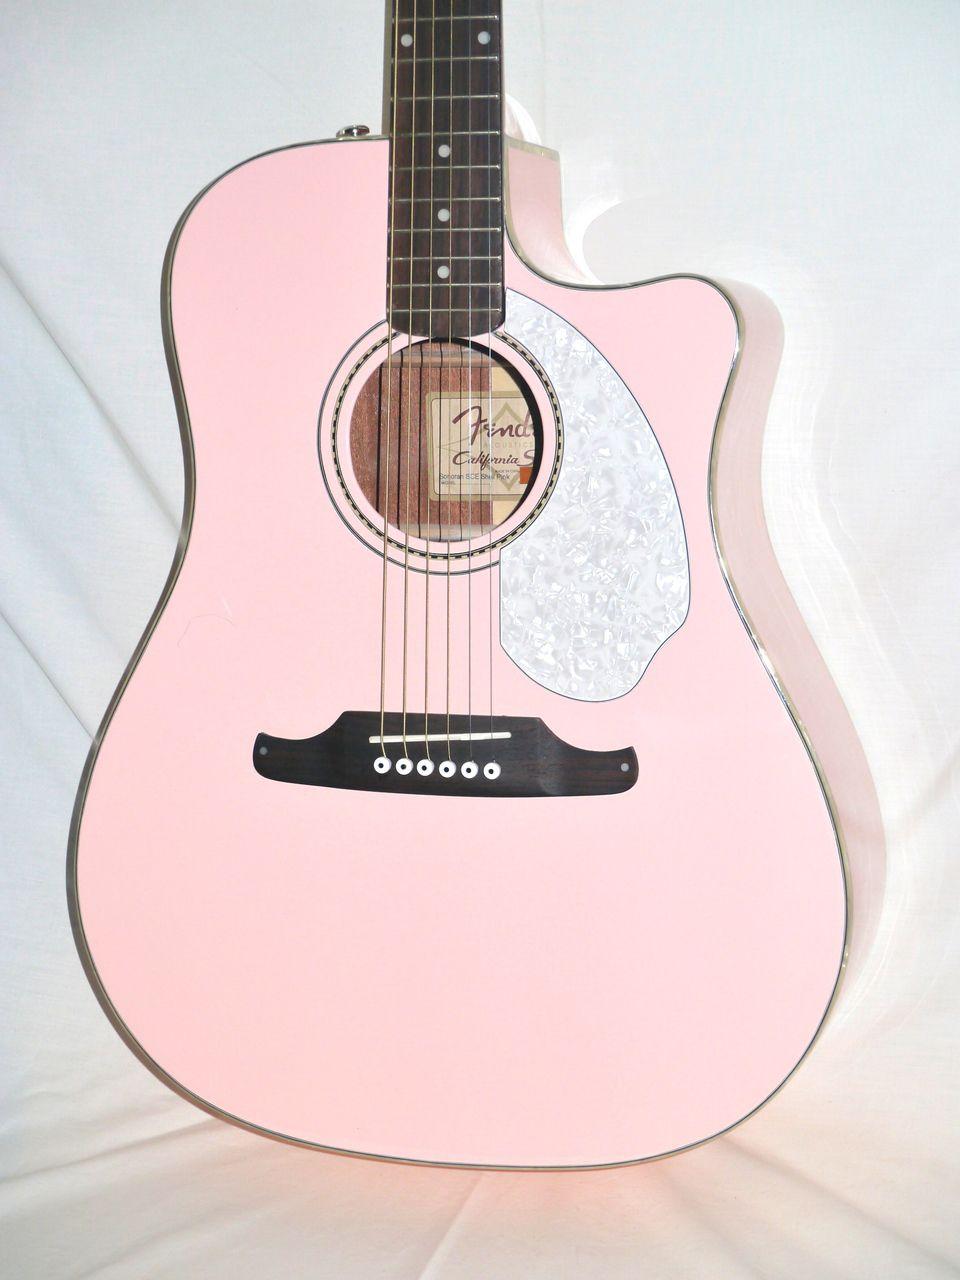 Fender Sonoran Sce Acoustic Electric Guitar Shell Pink Pink Guitar Acoustic Electric Guitar Guitar